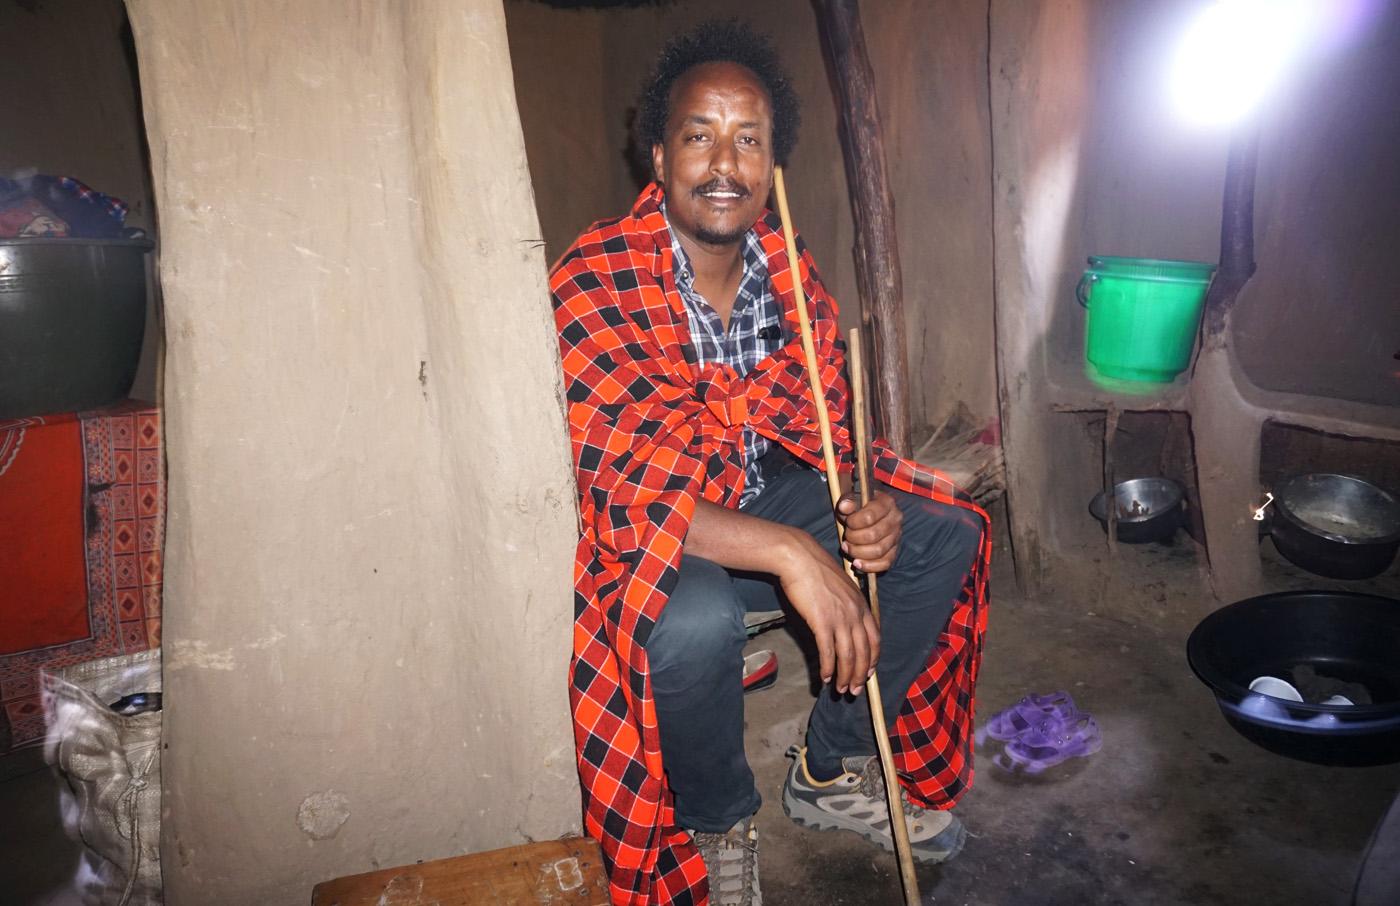 Friendly moments with the Maasai in their Bomas (Ololaimutia village, Kenya)